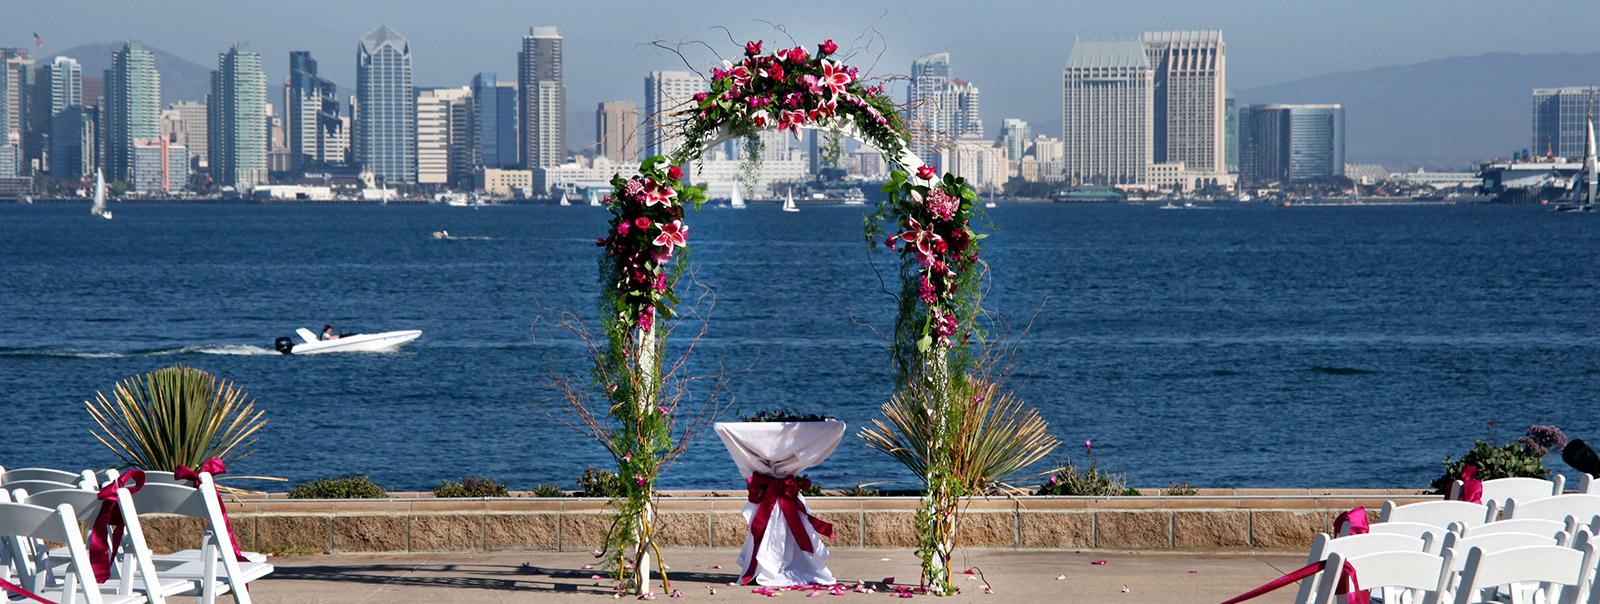 san diego great outdoor wedding location